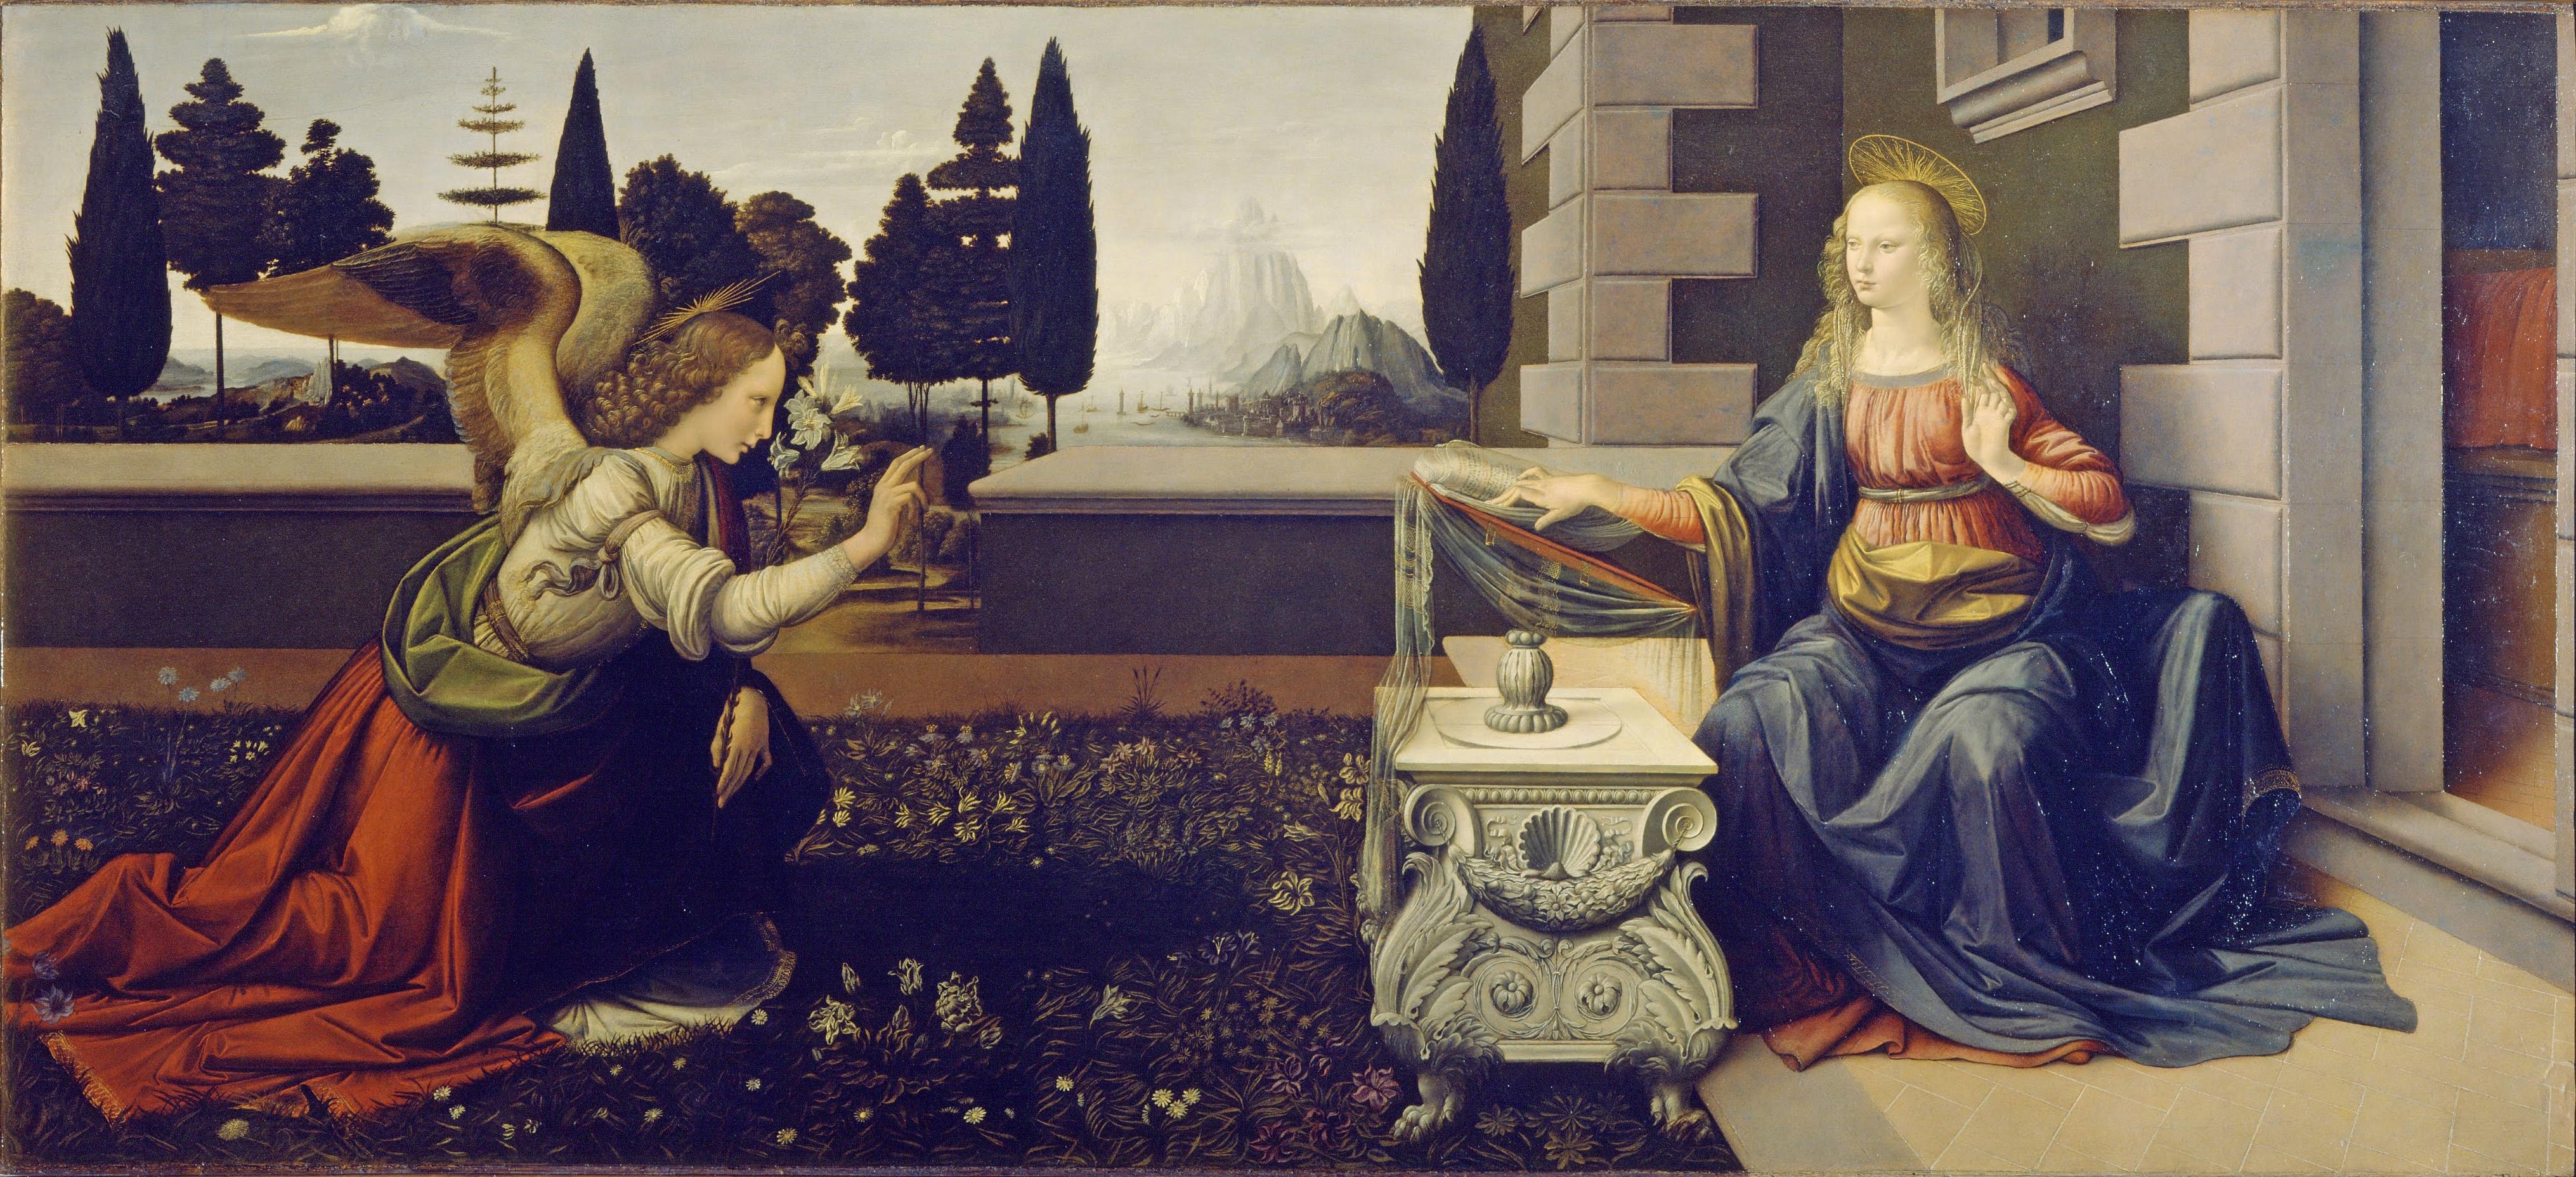 The Christmas story in art: archangel Gabriel appears ...